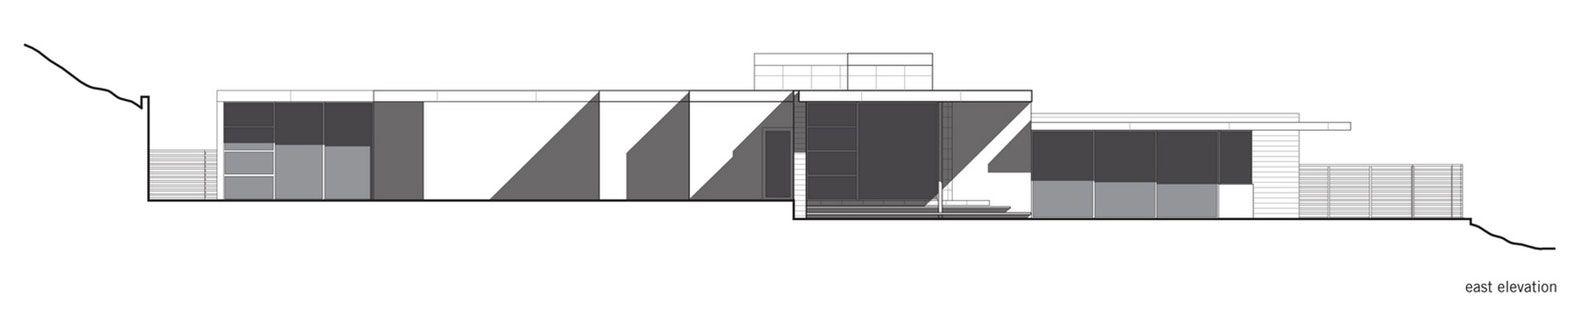 McElroy-Residence-13